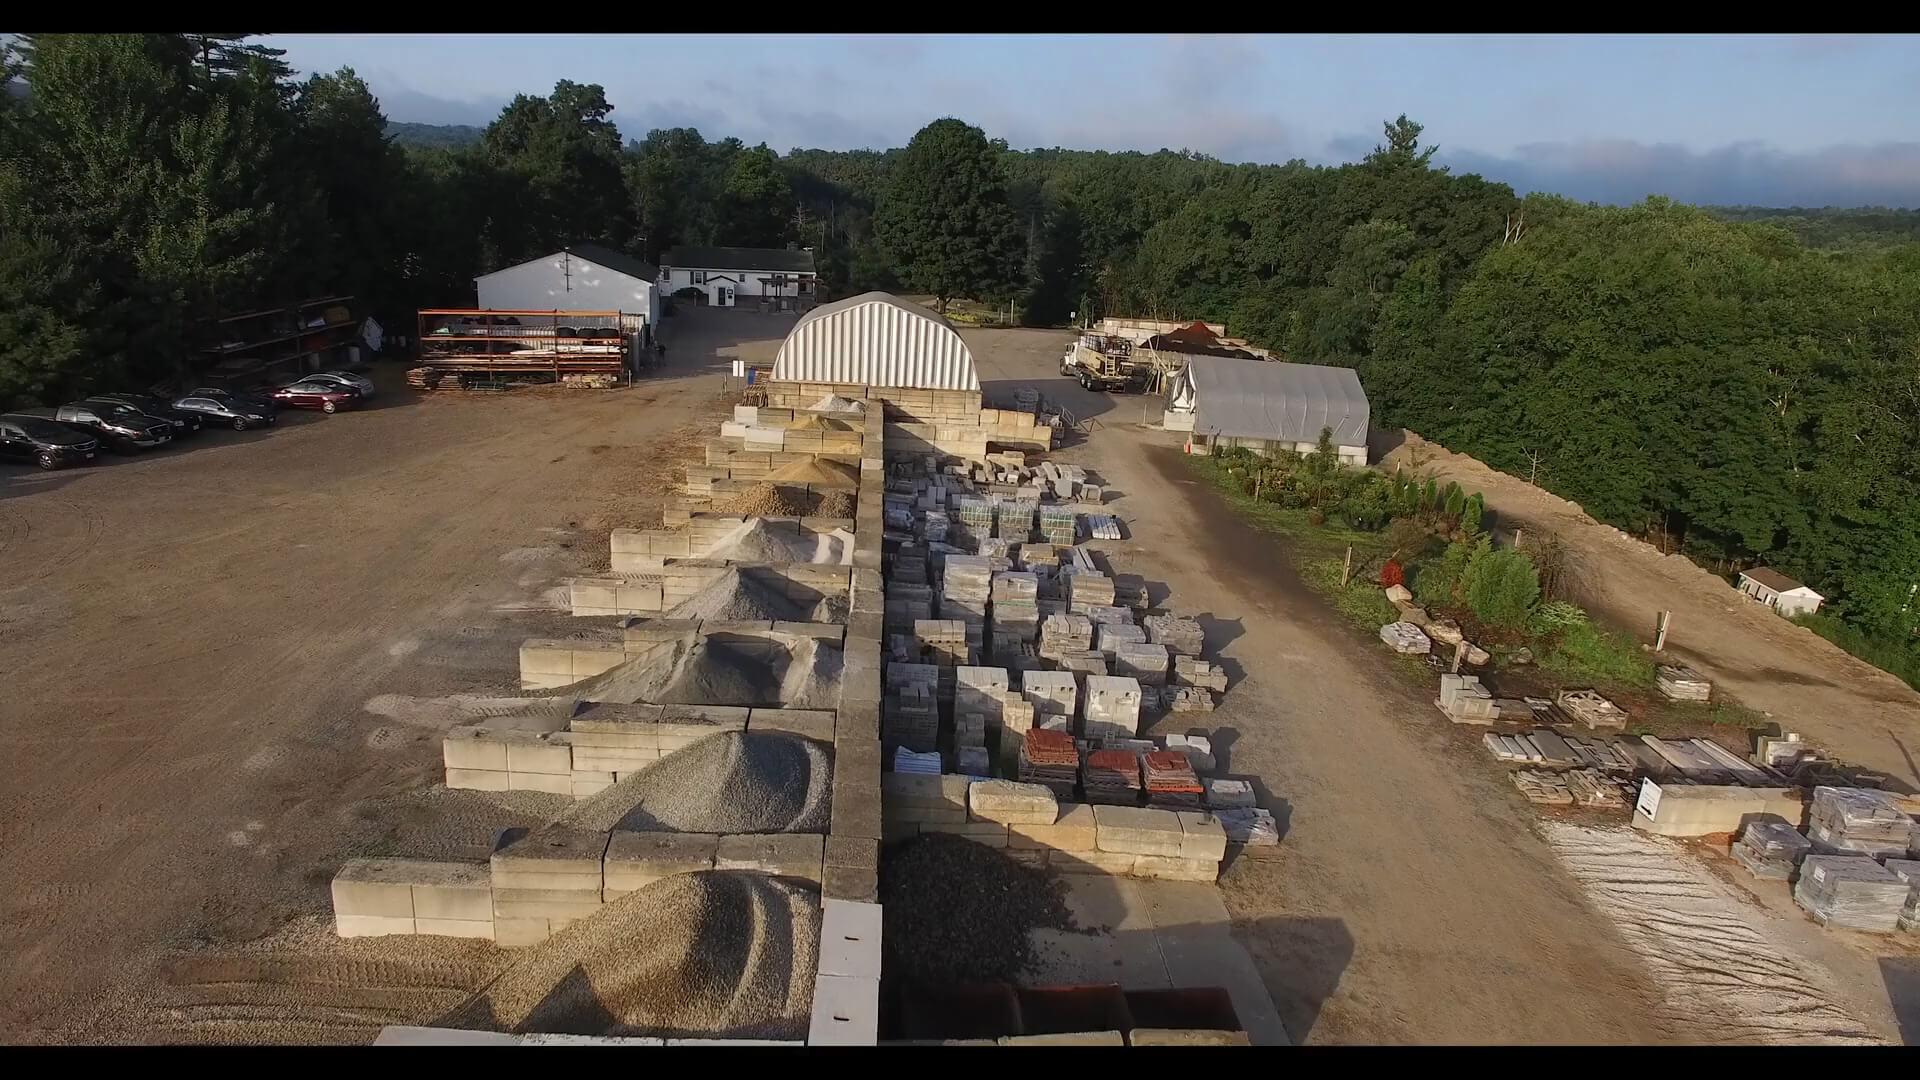 Blackstone Landscape Supply